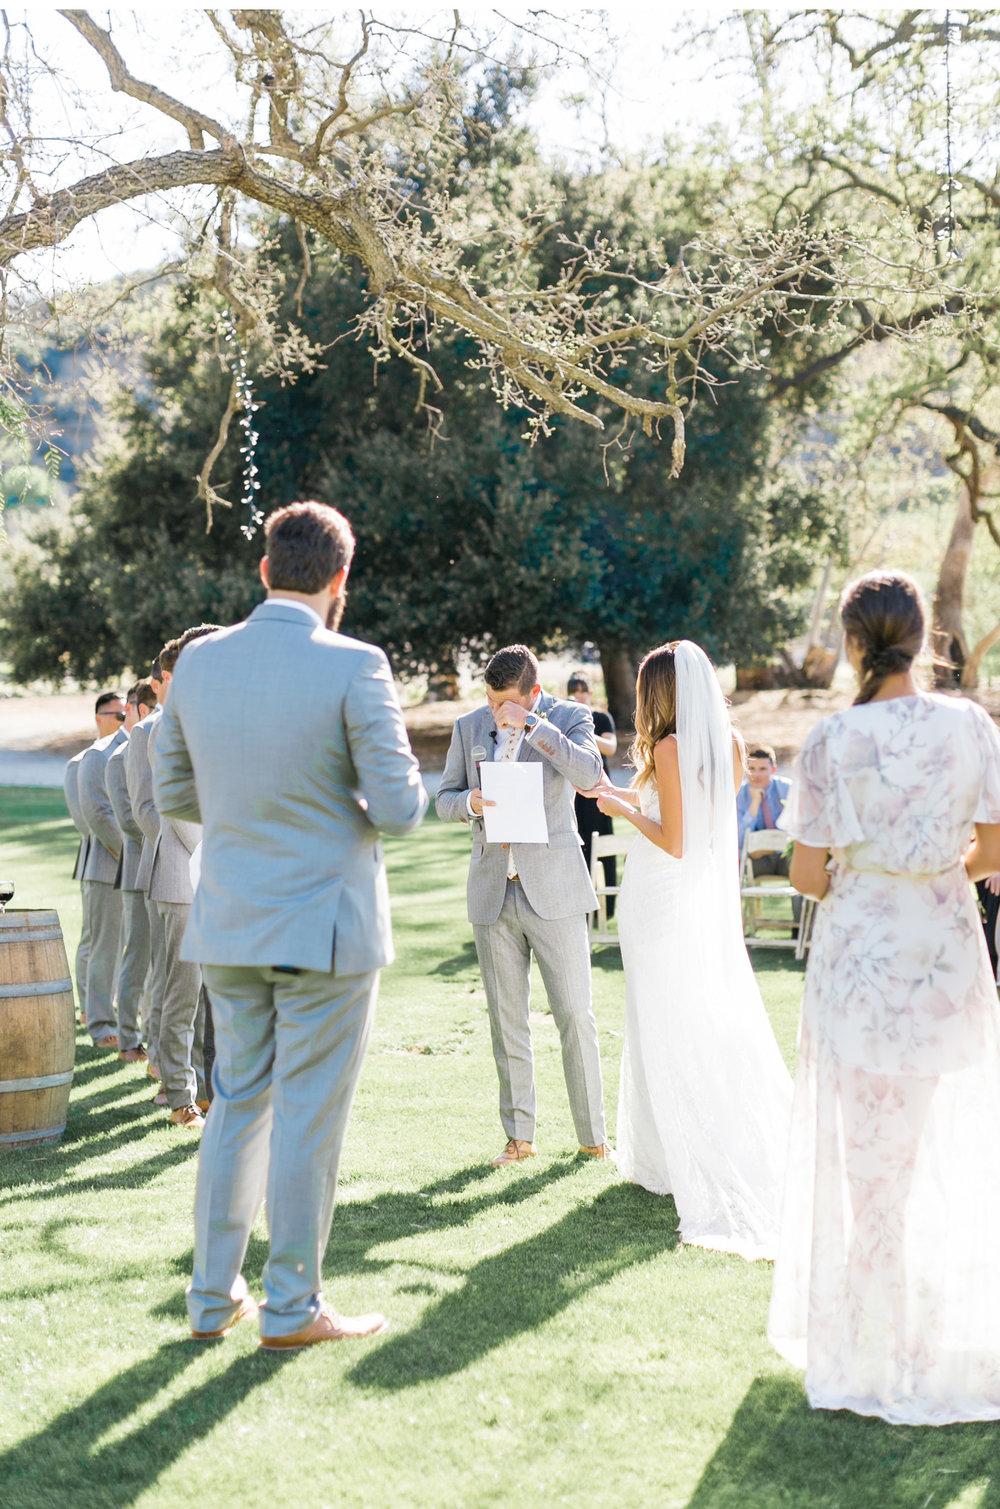 Malibu-Wedding-Photographer-Triunfo-Creek-Natalie-Schutt-Photography_12.jpg